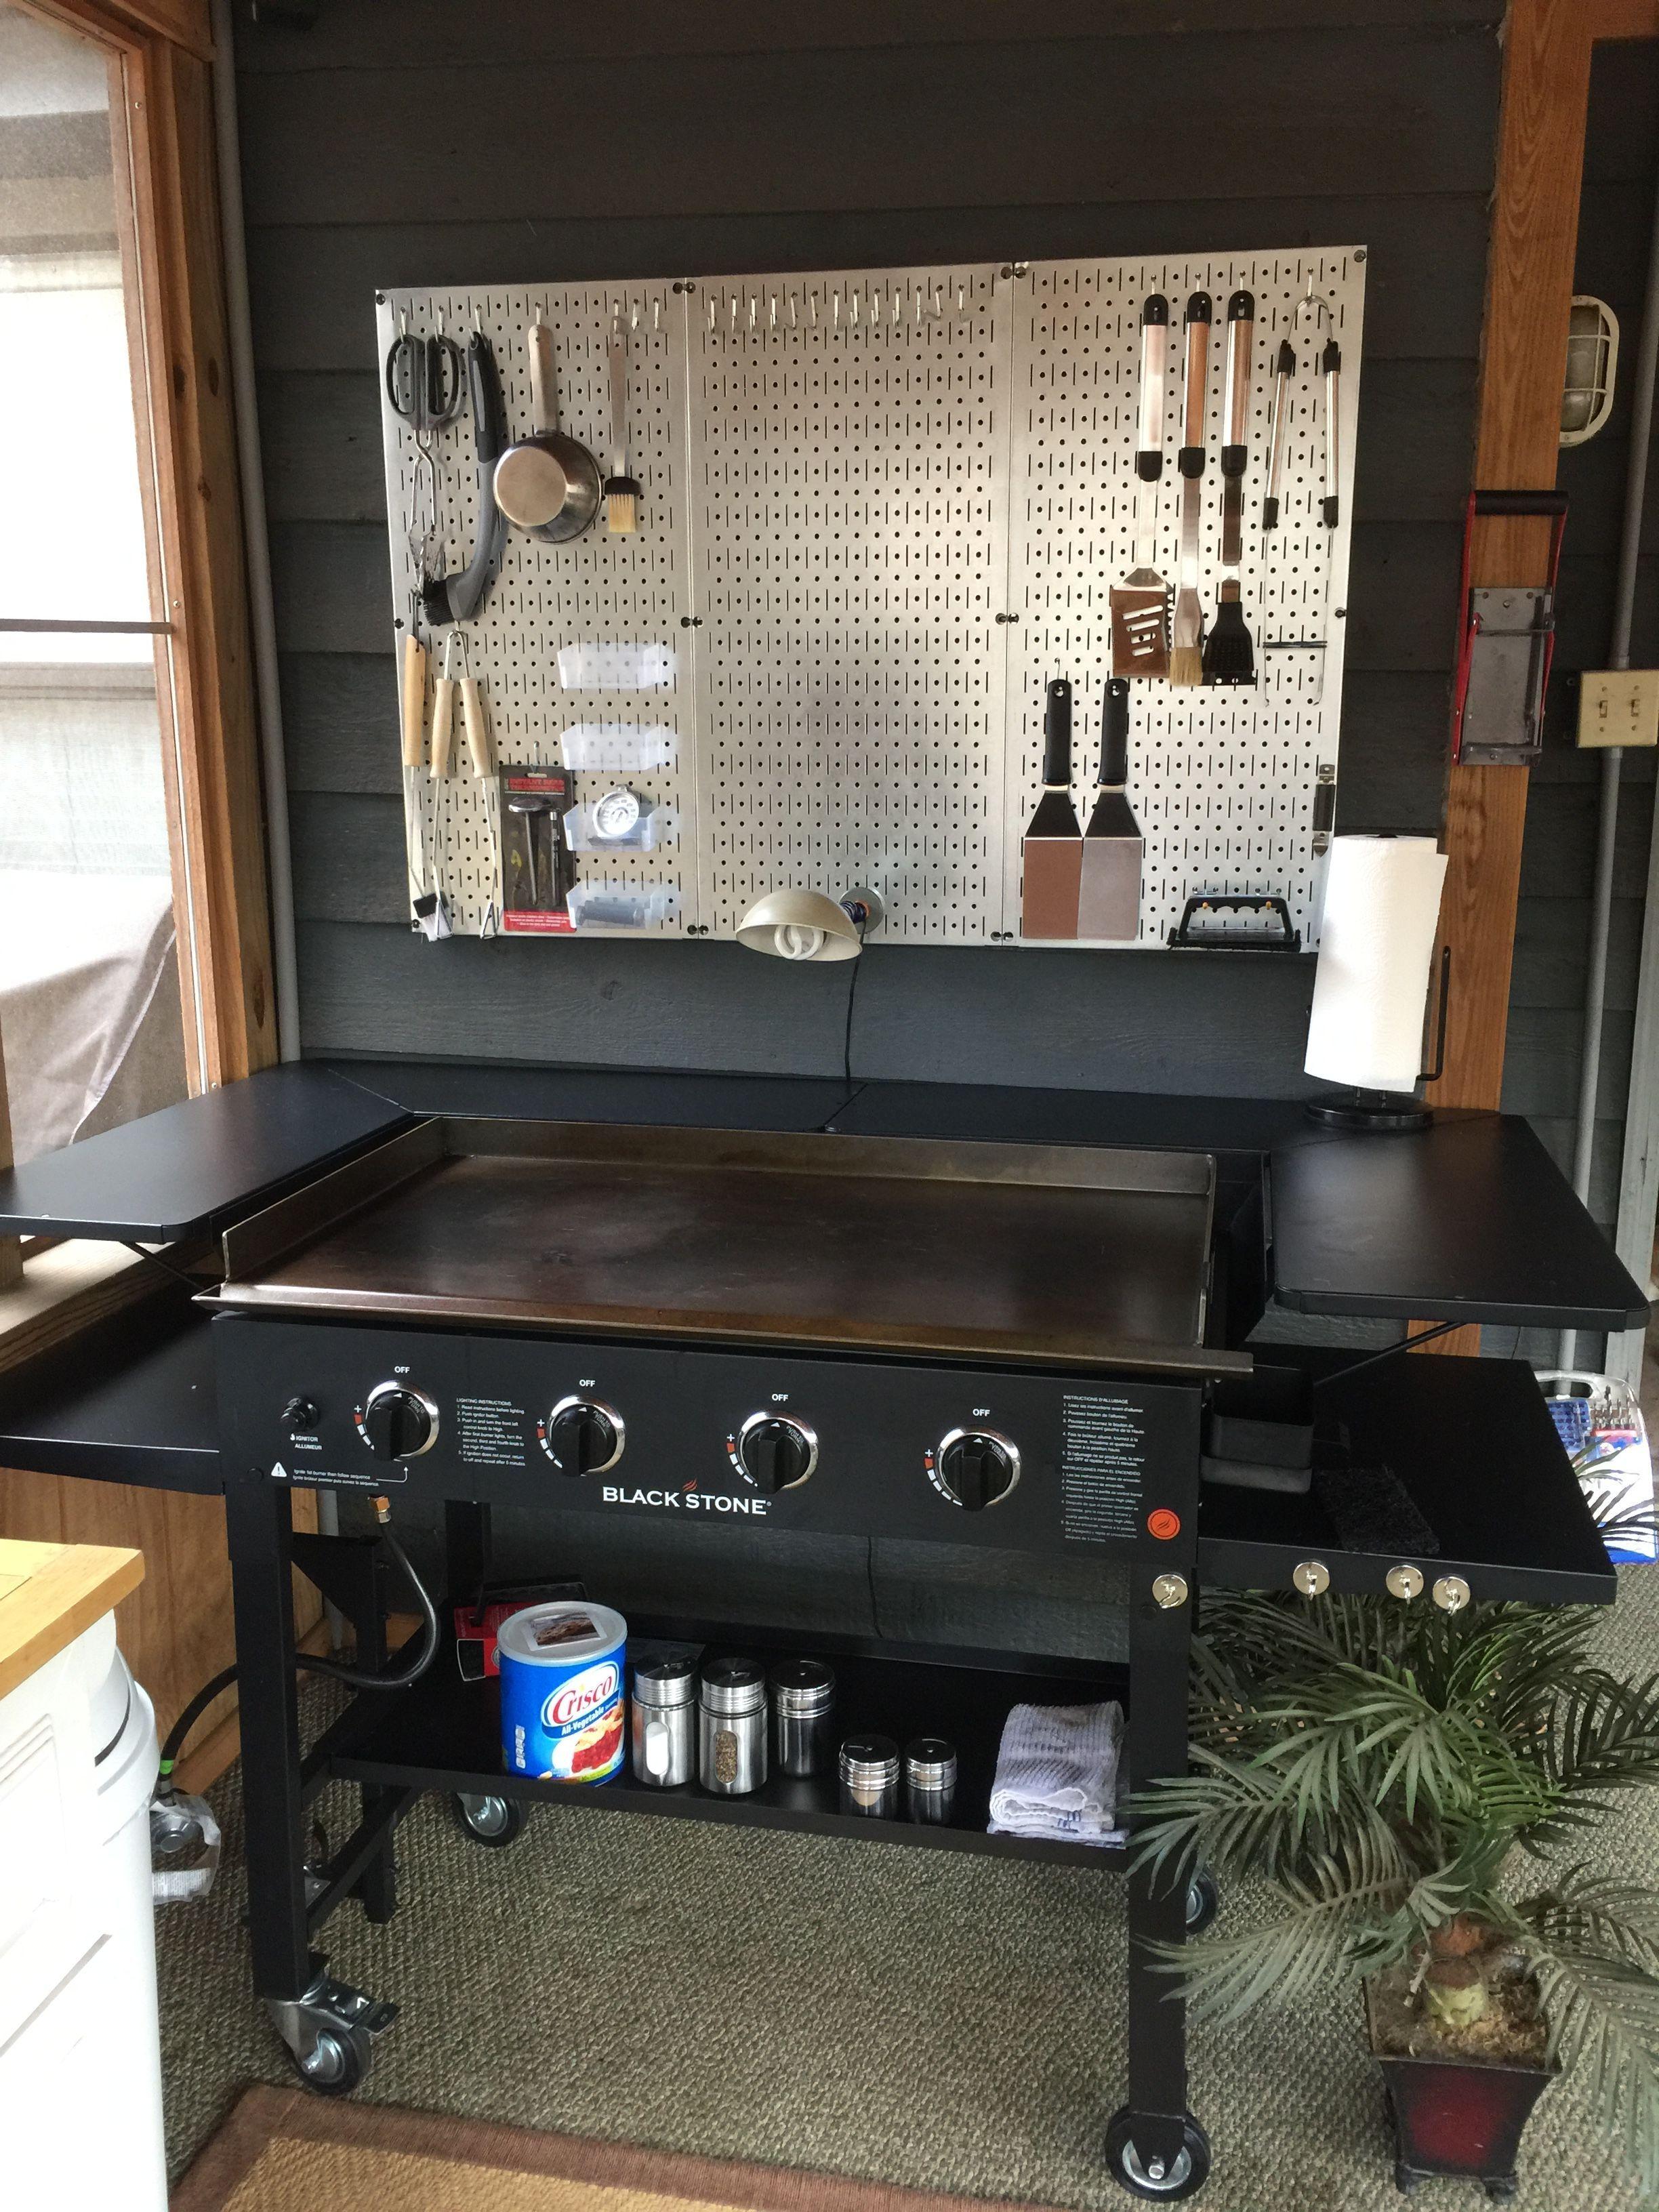 Adf26427f20d5913d640383e5ad459a2 Jpg 2 448 3 264 Pixels Outdoor Kitchen Patio Backyard Kitchen Flat Top Grill